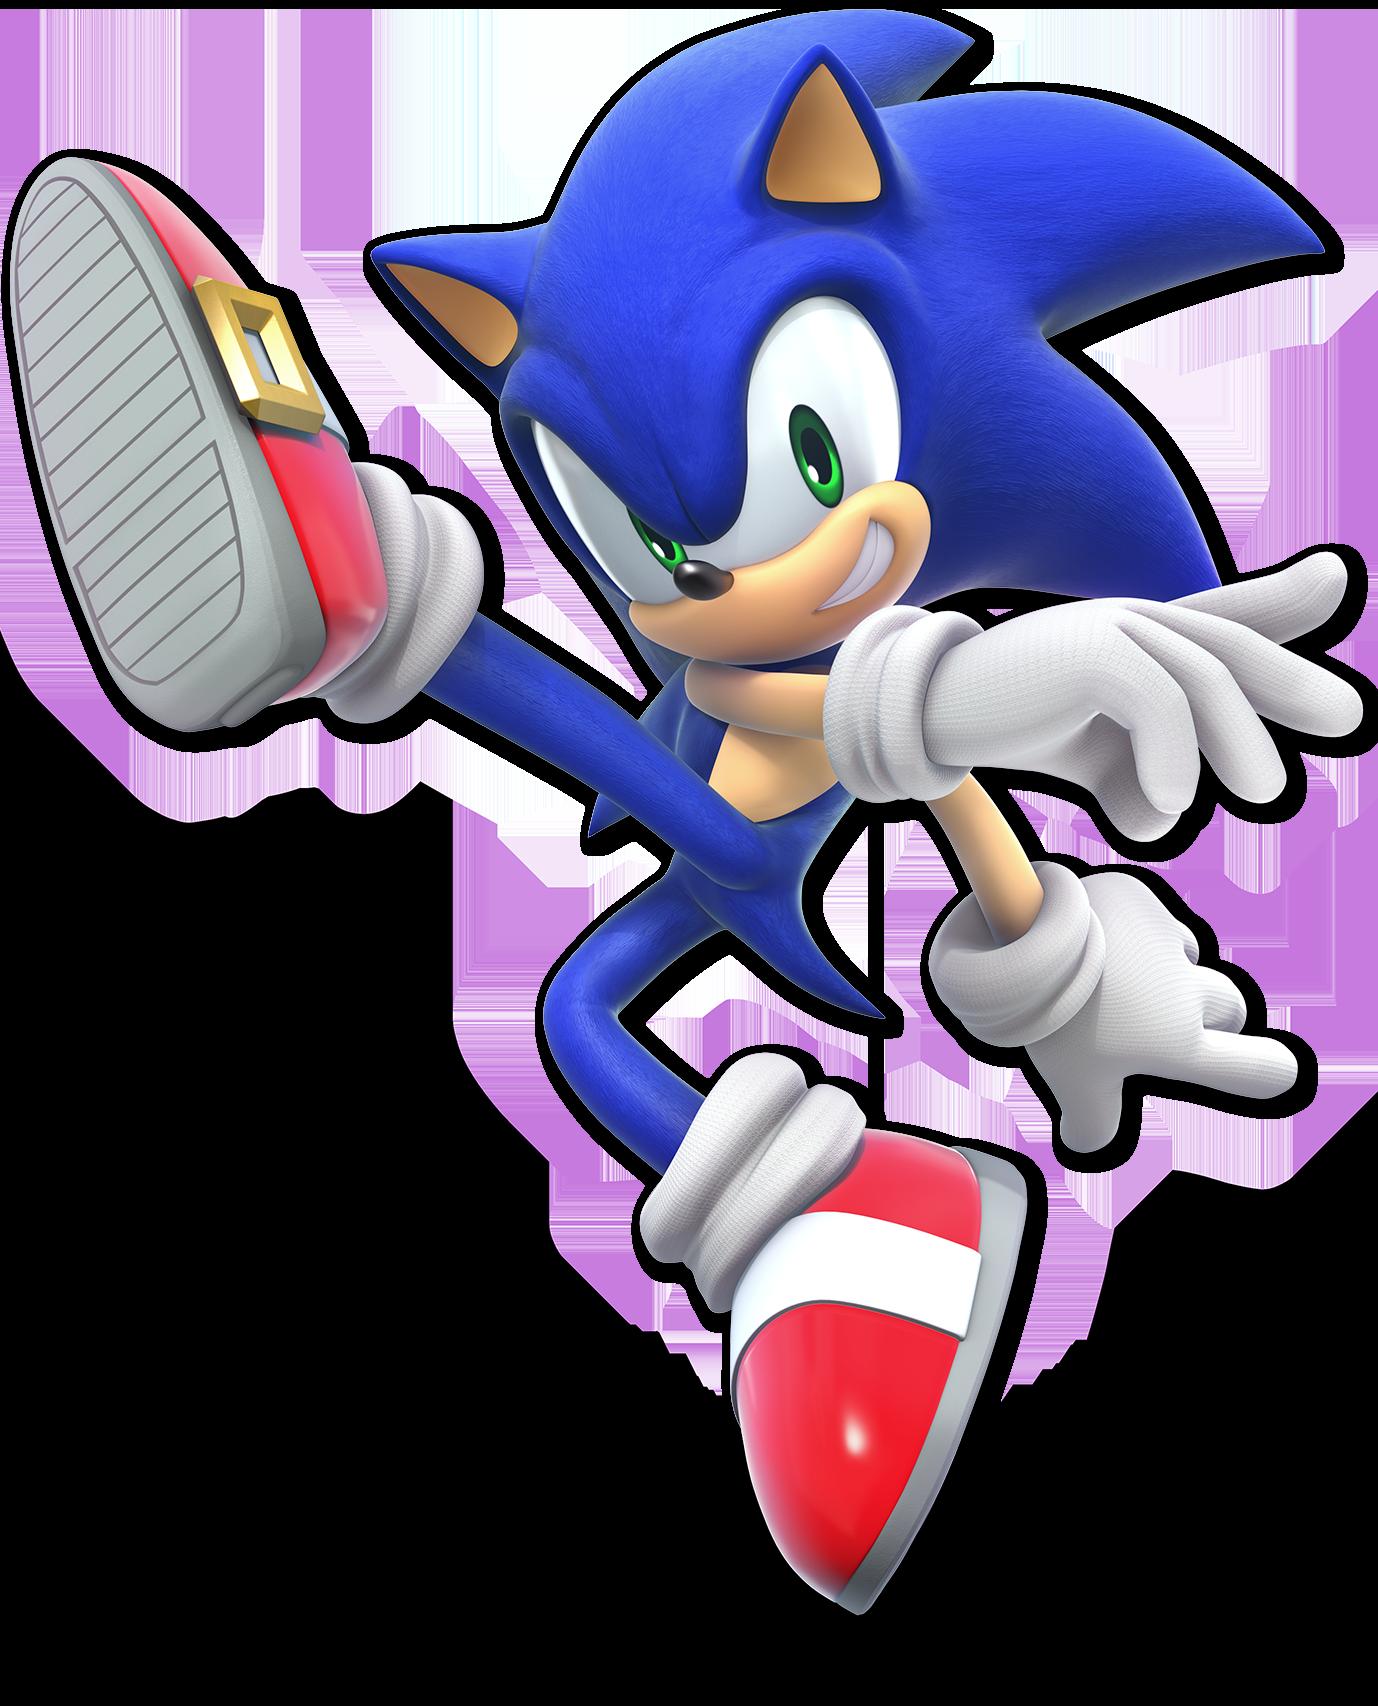 Sonic the Hedgehog   MarioWiki   FANDOM powered by Wikia